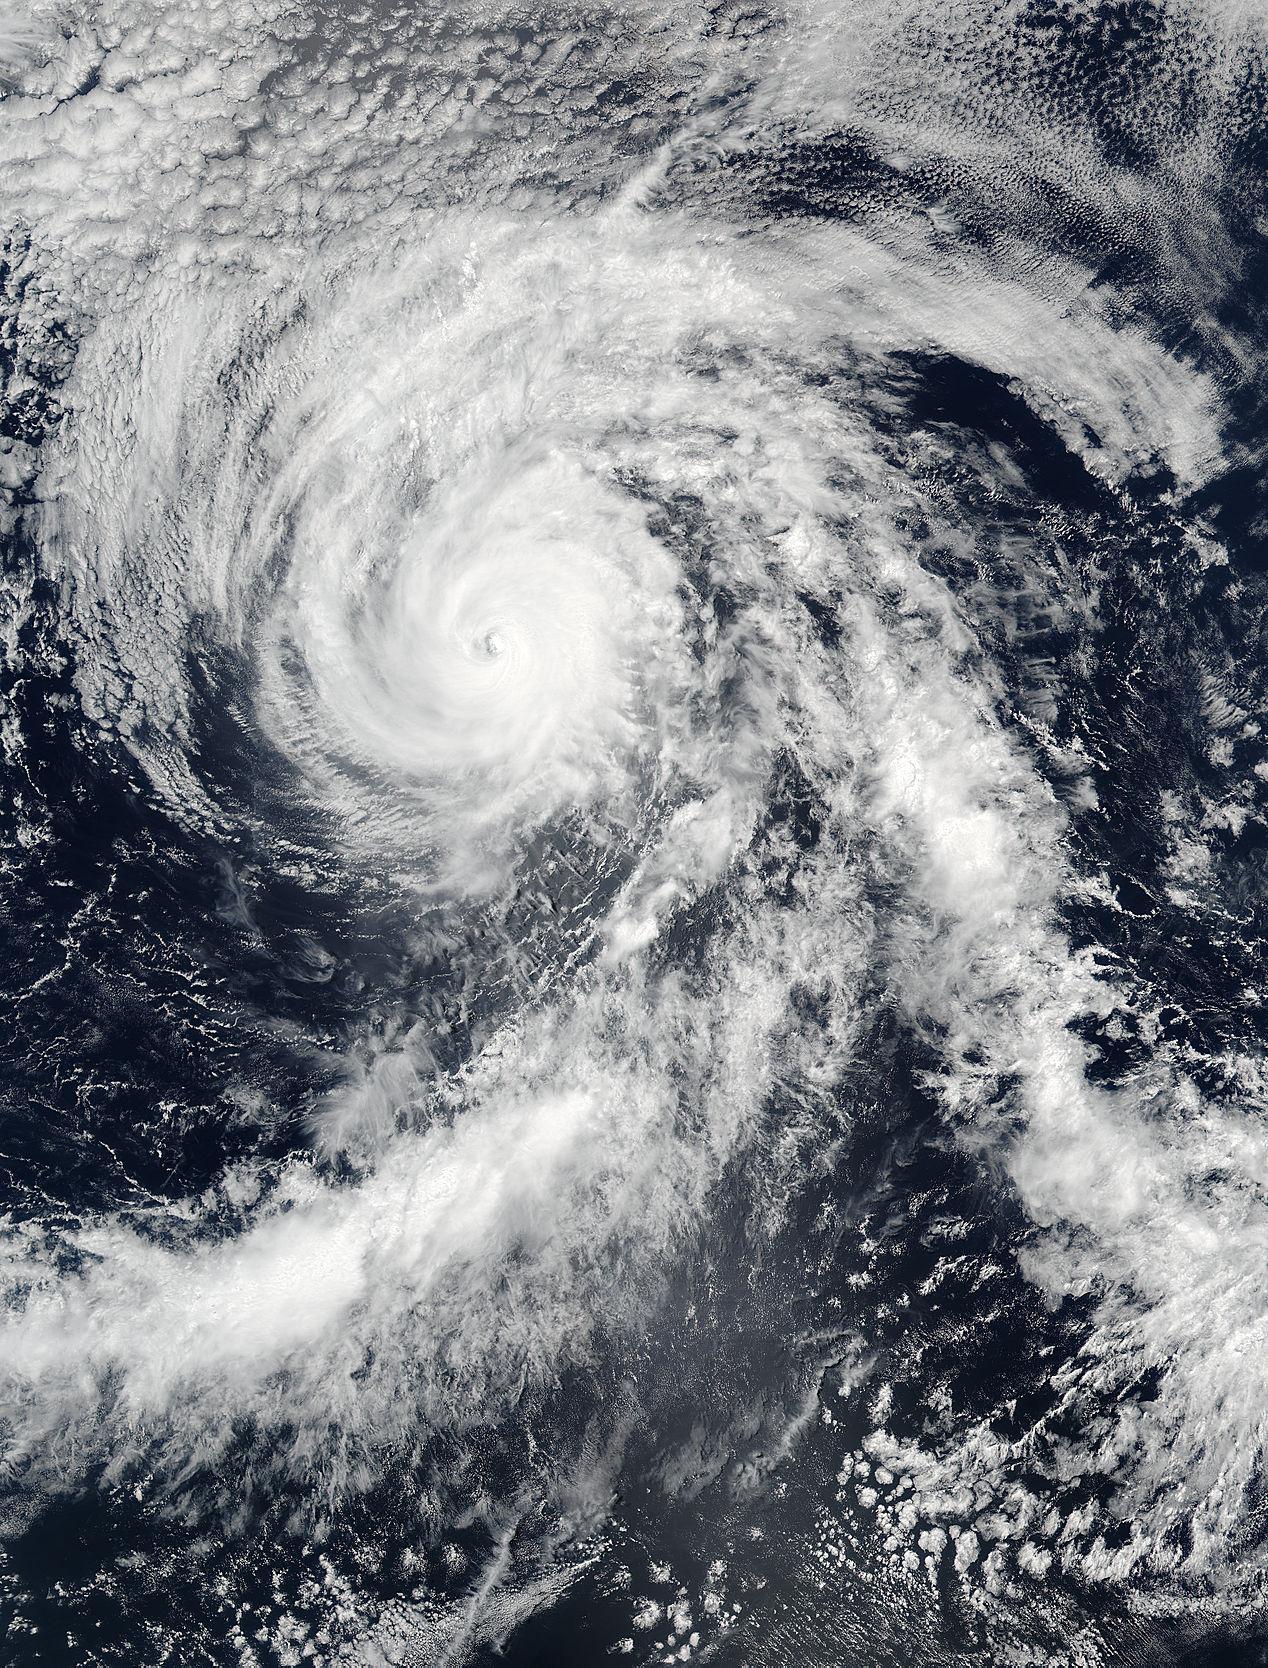 NASA sees Hurricane Blas closing its eye